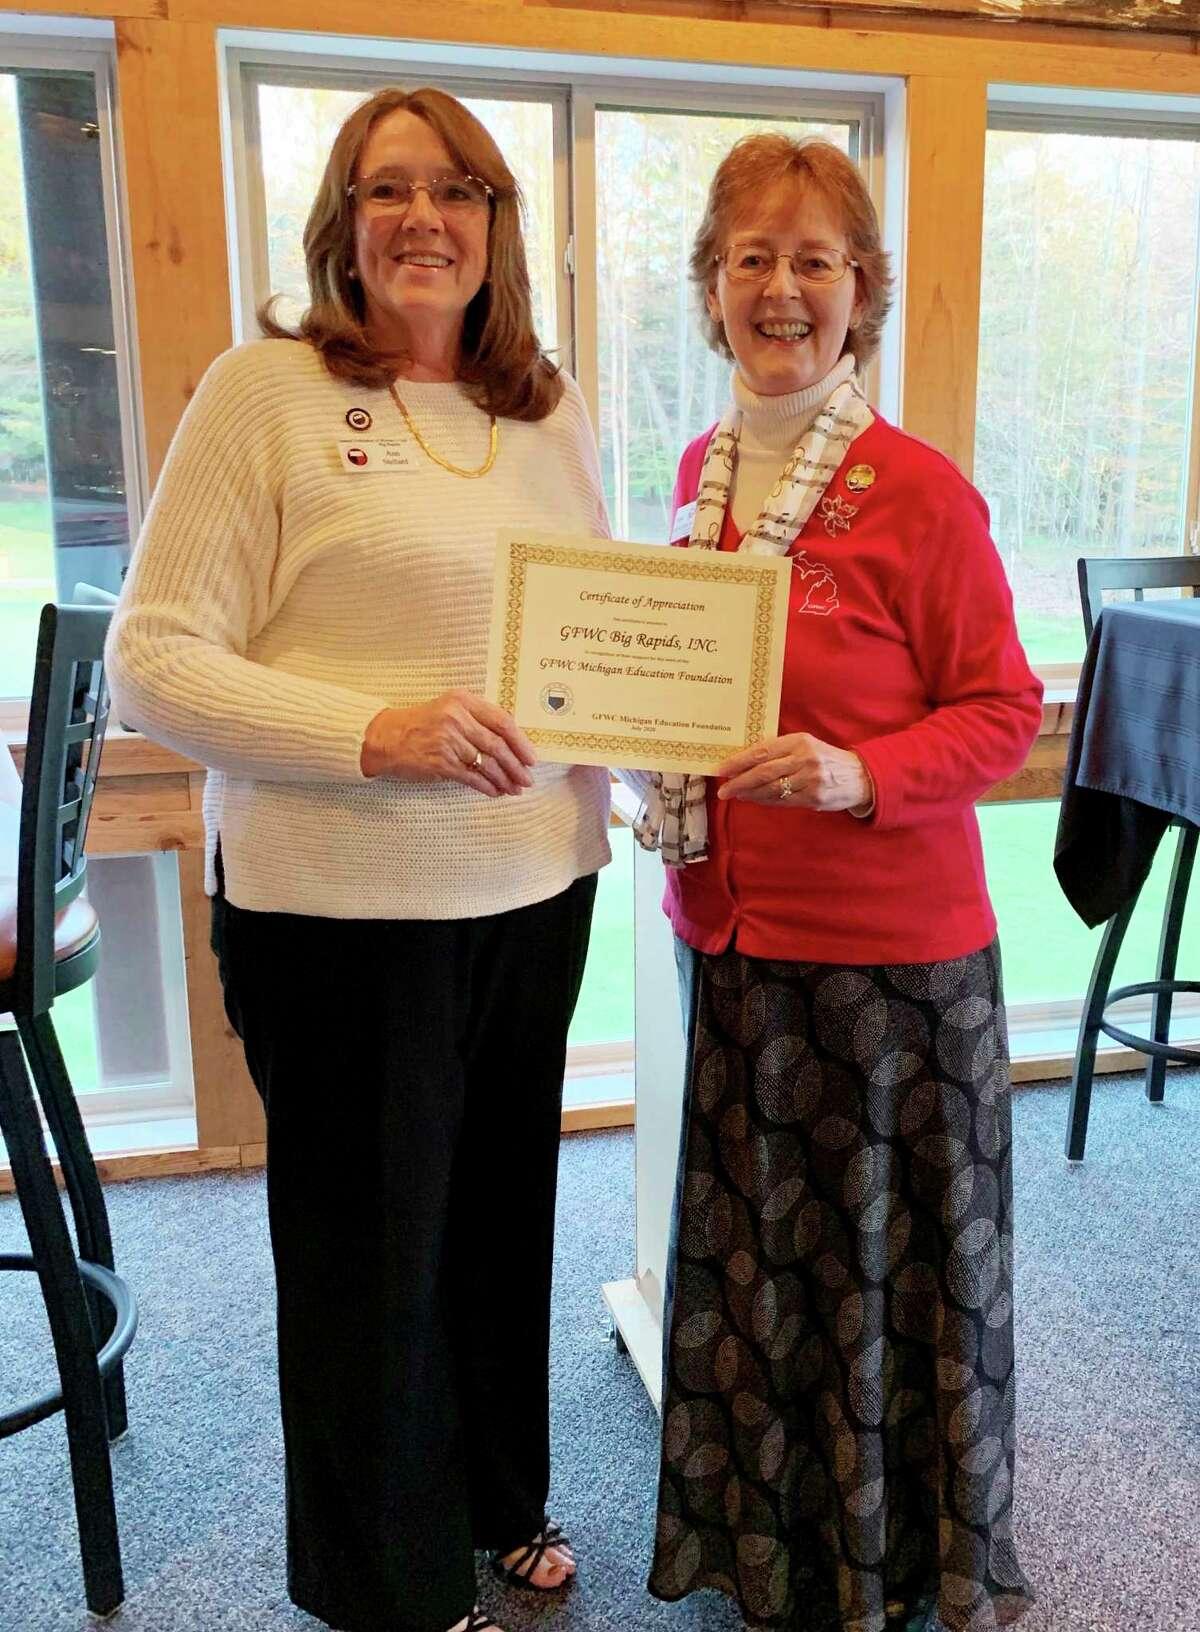 Pictured is GFWC Big Rapids President Ann Stellard and GFWC MI President Ruth Ann Northon honoring the club. (Courtesy photo)